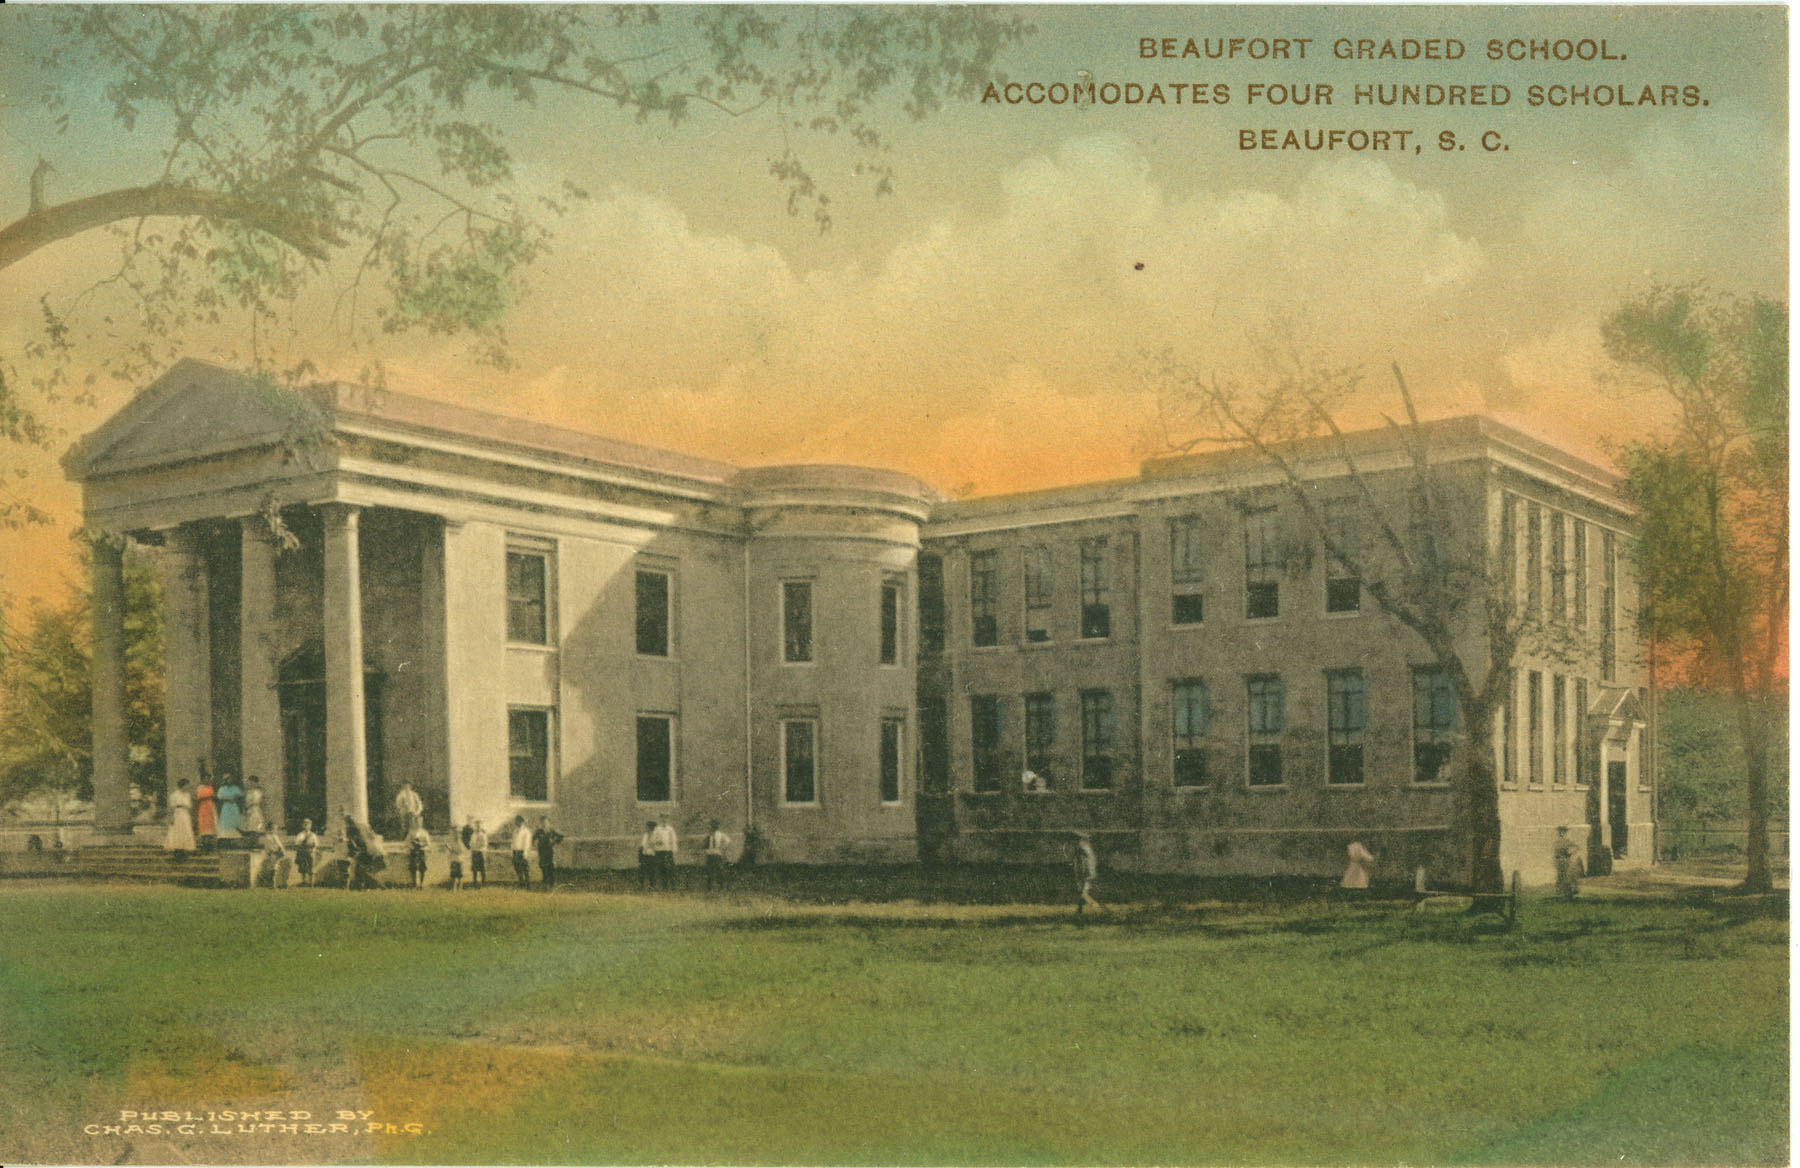 Beaufort Graded School. Accommodates Four Hundred Scholars. Beaufort, South Carolina